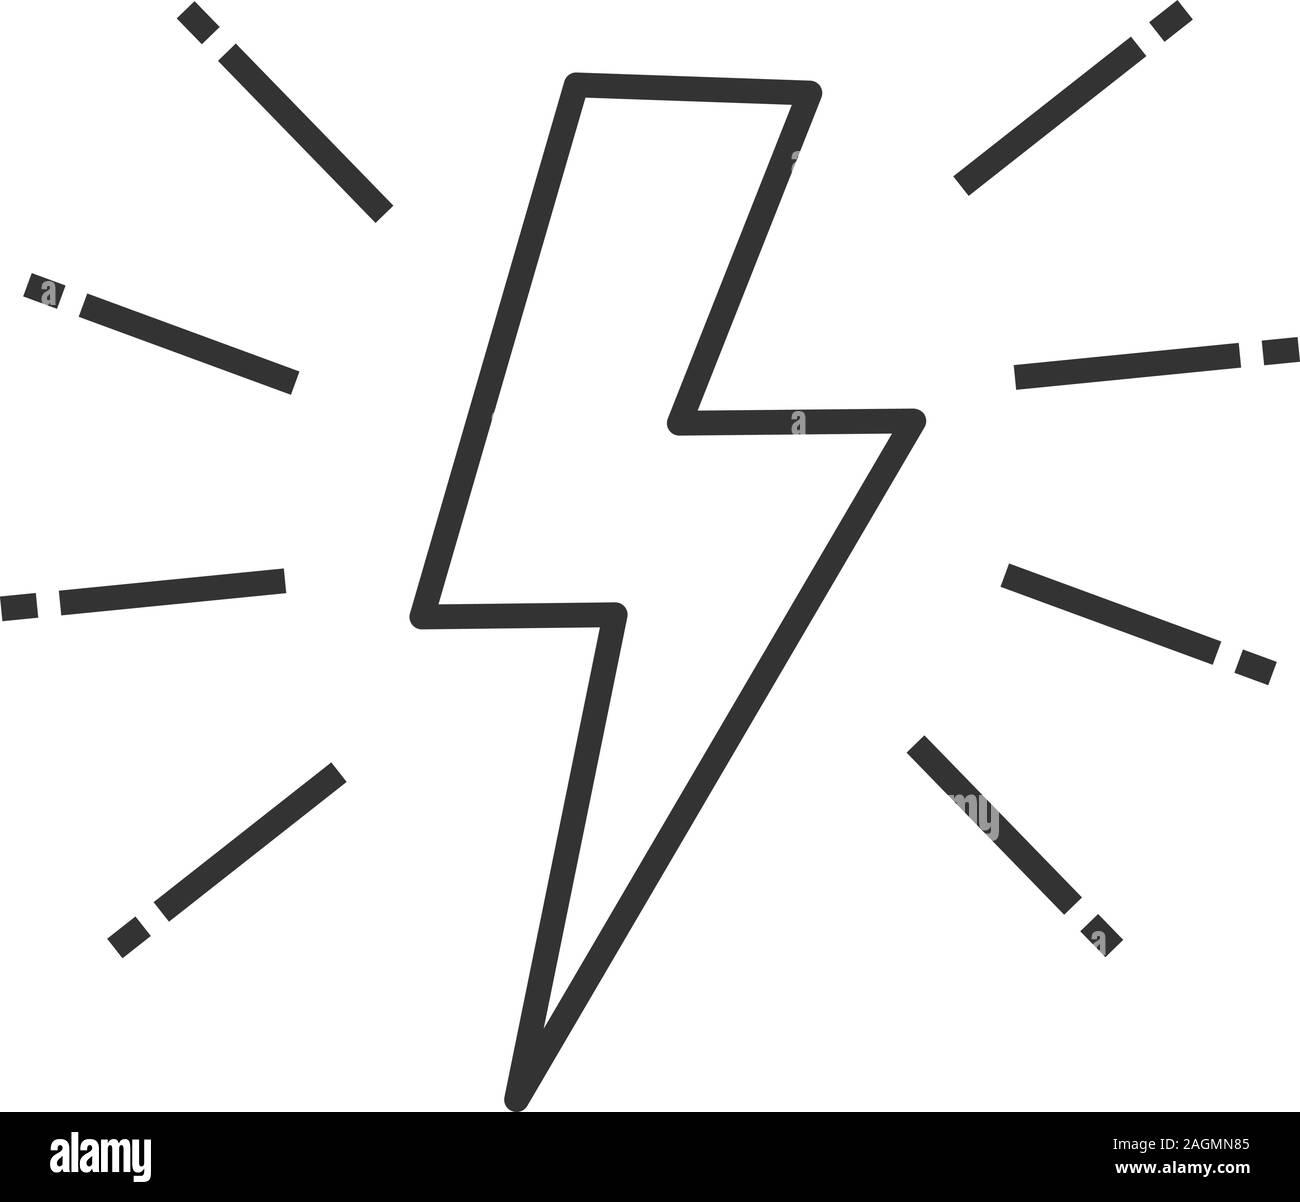 Lightning bolt linear icon. Thin line illustration. Electricity ...